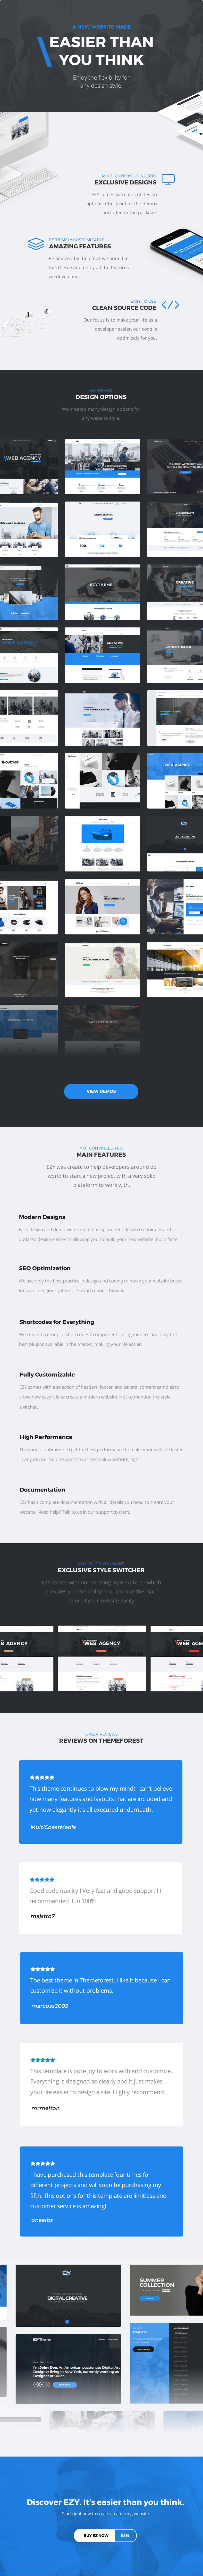 EZY - Responsive Multi-Purpose HTML5 Template - 2